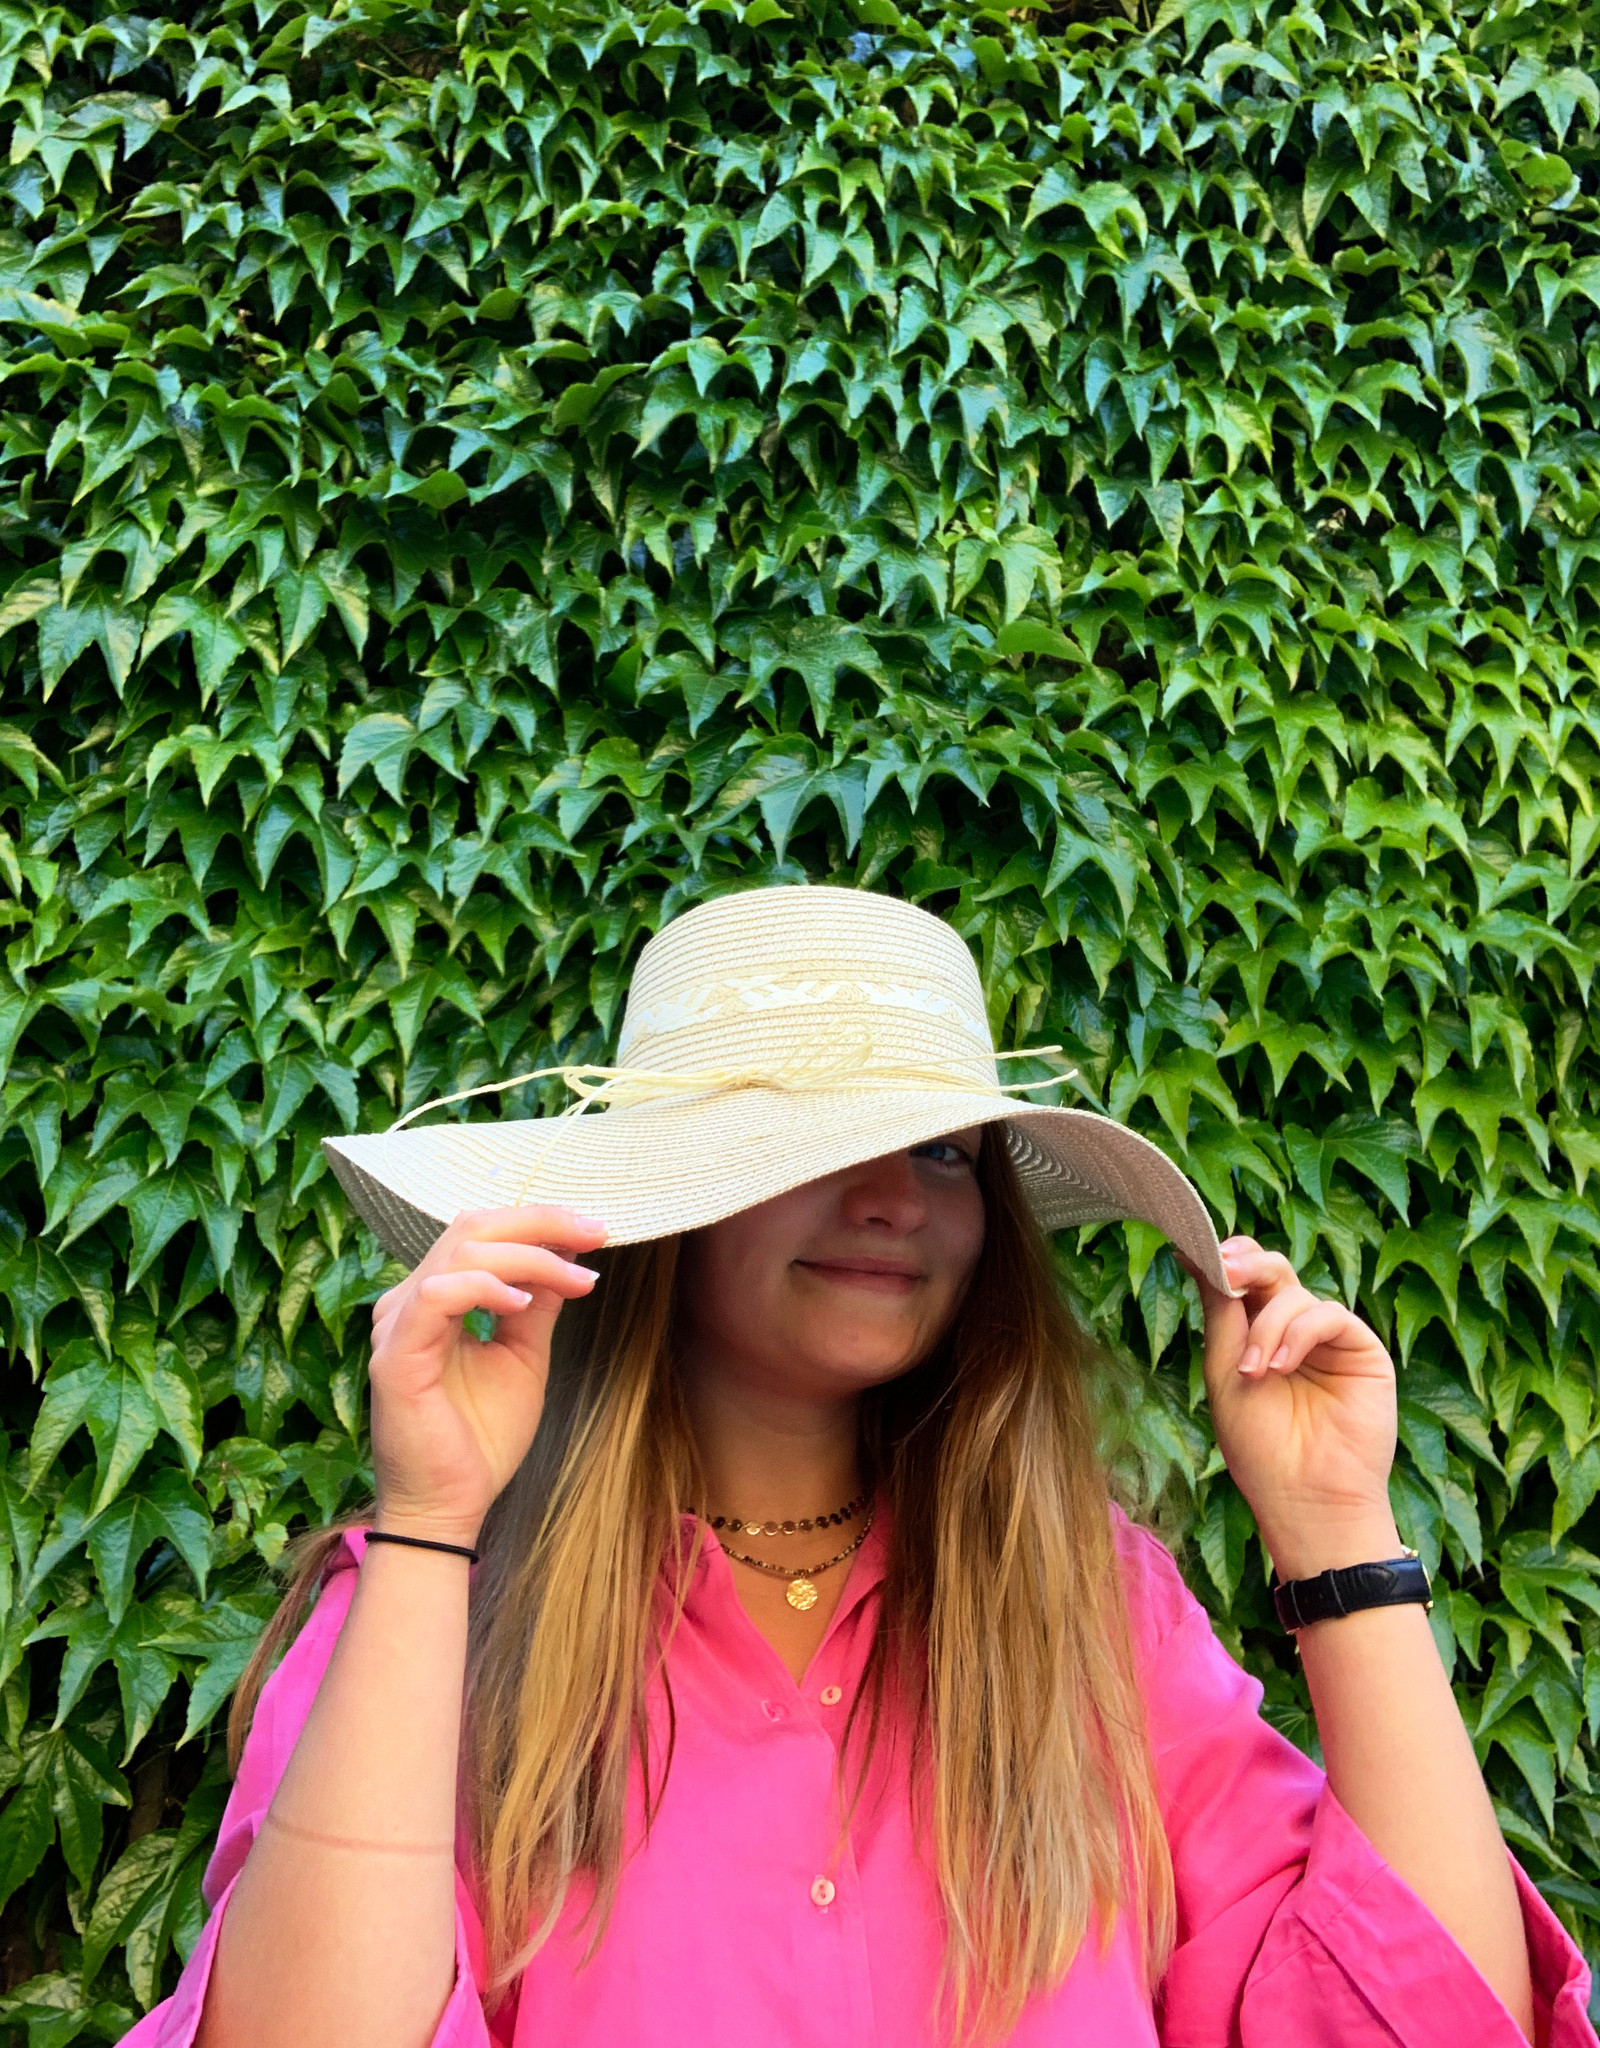 Stijlvolle classy hoed